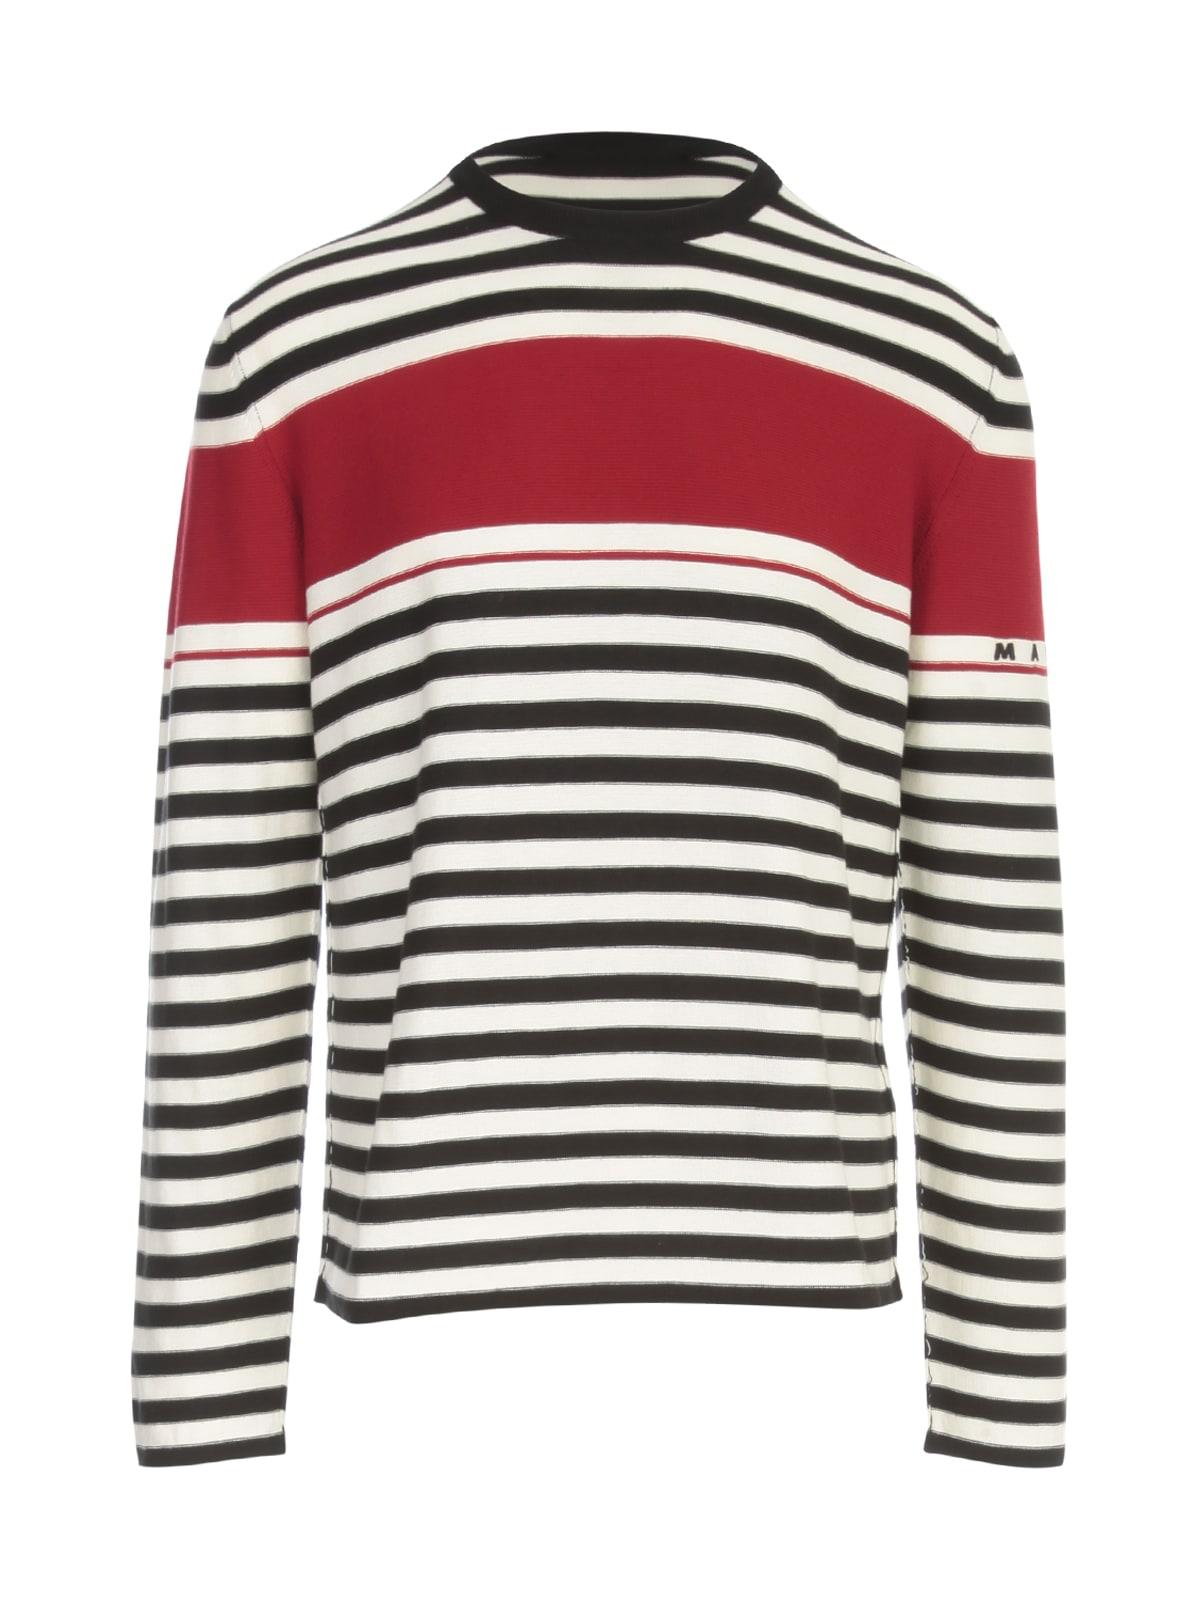 Marni Sweatshirts STRIPED CREW NECK L/S SWEATER W/LOGO ON SLEEVE